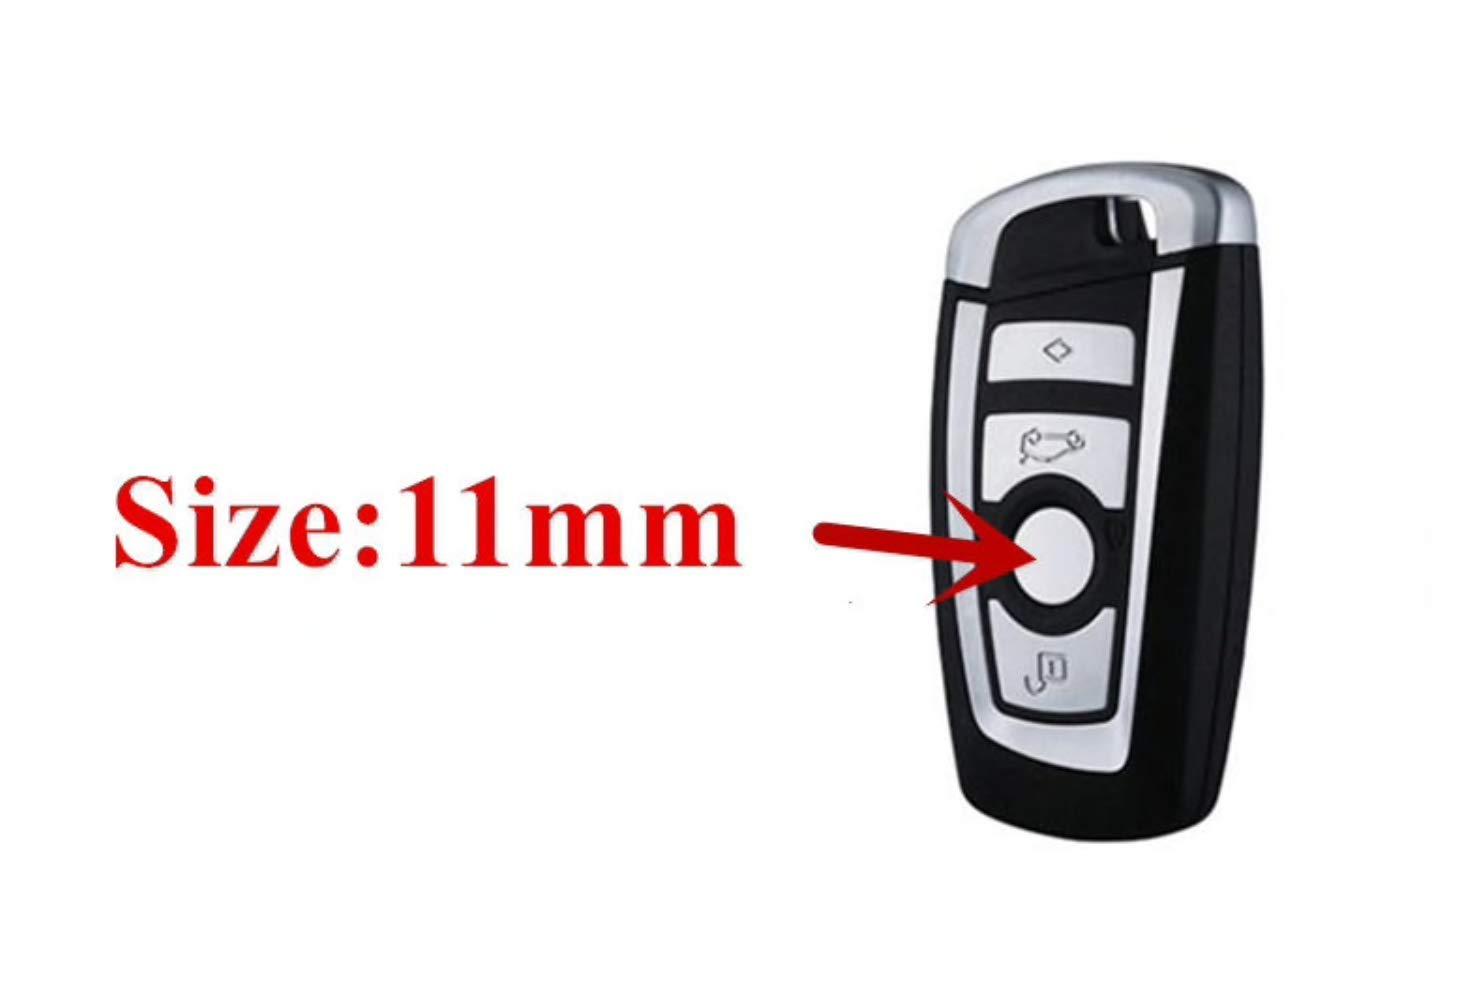 11 mm 66122155754 B M W Schl/üssellogo-Emblem